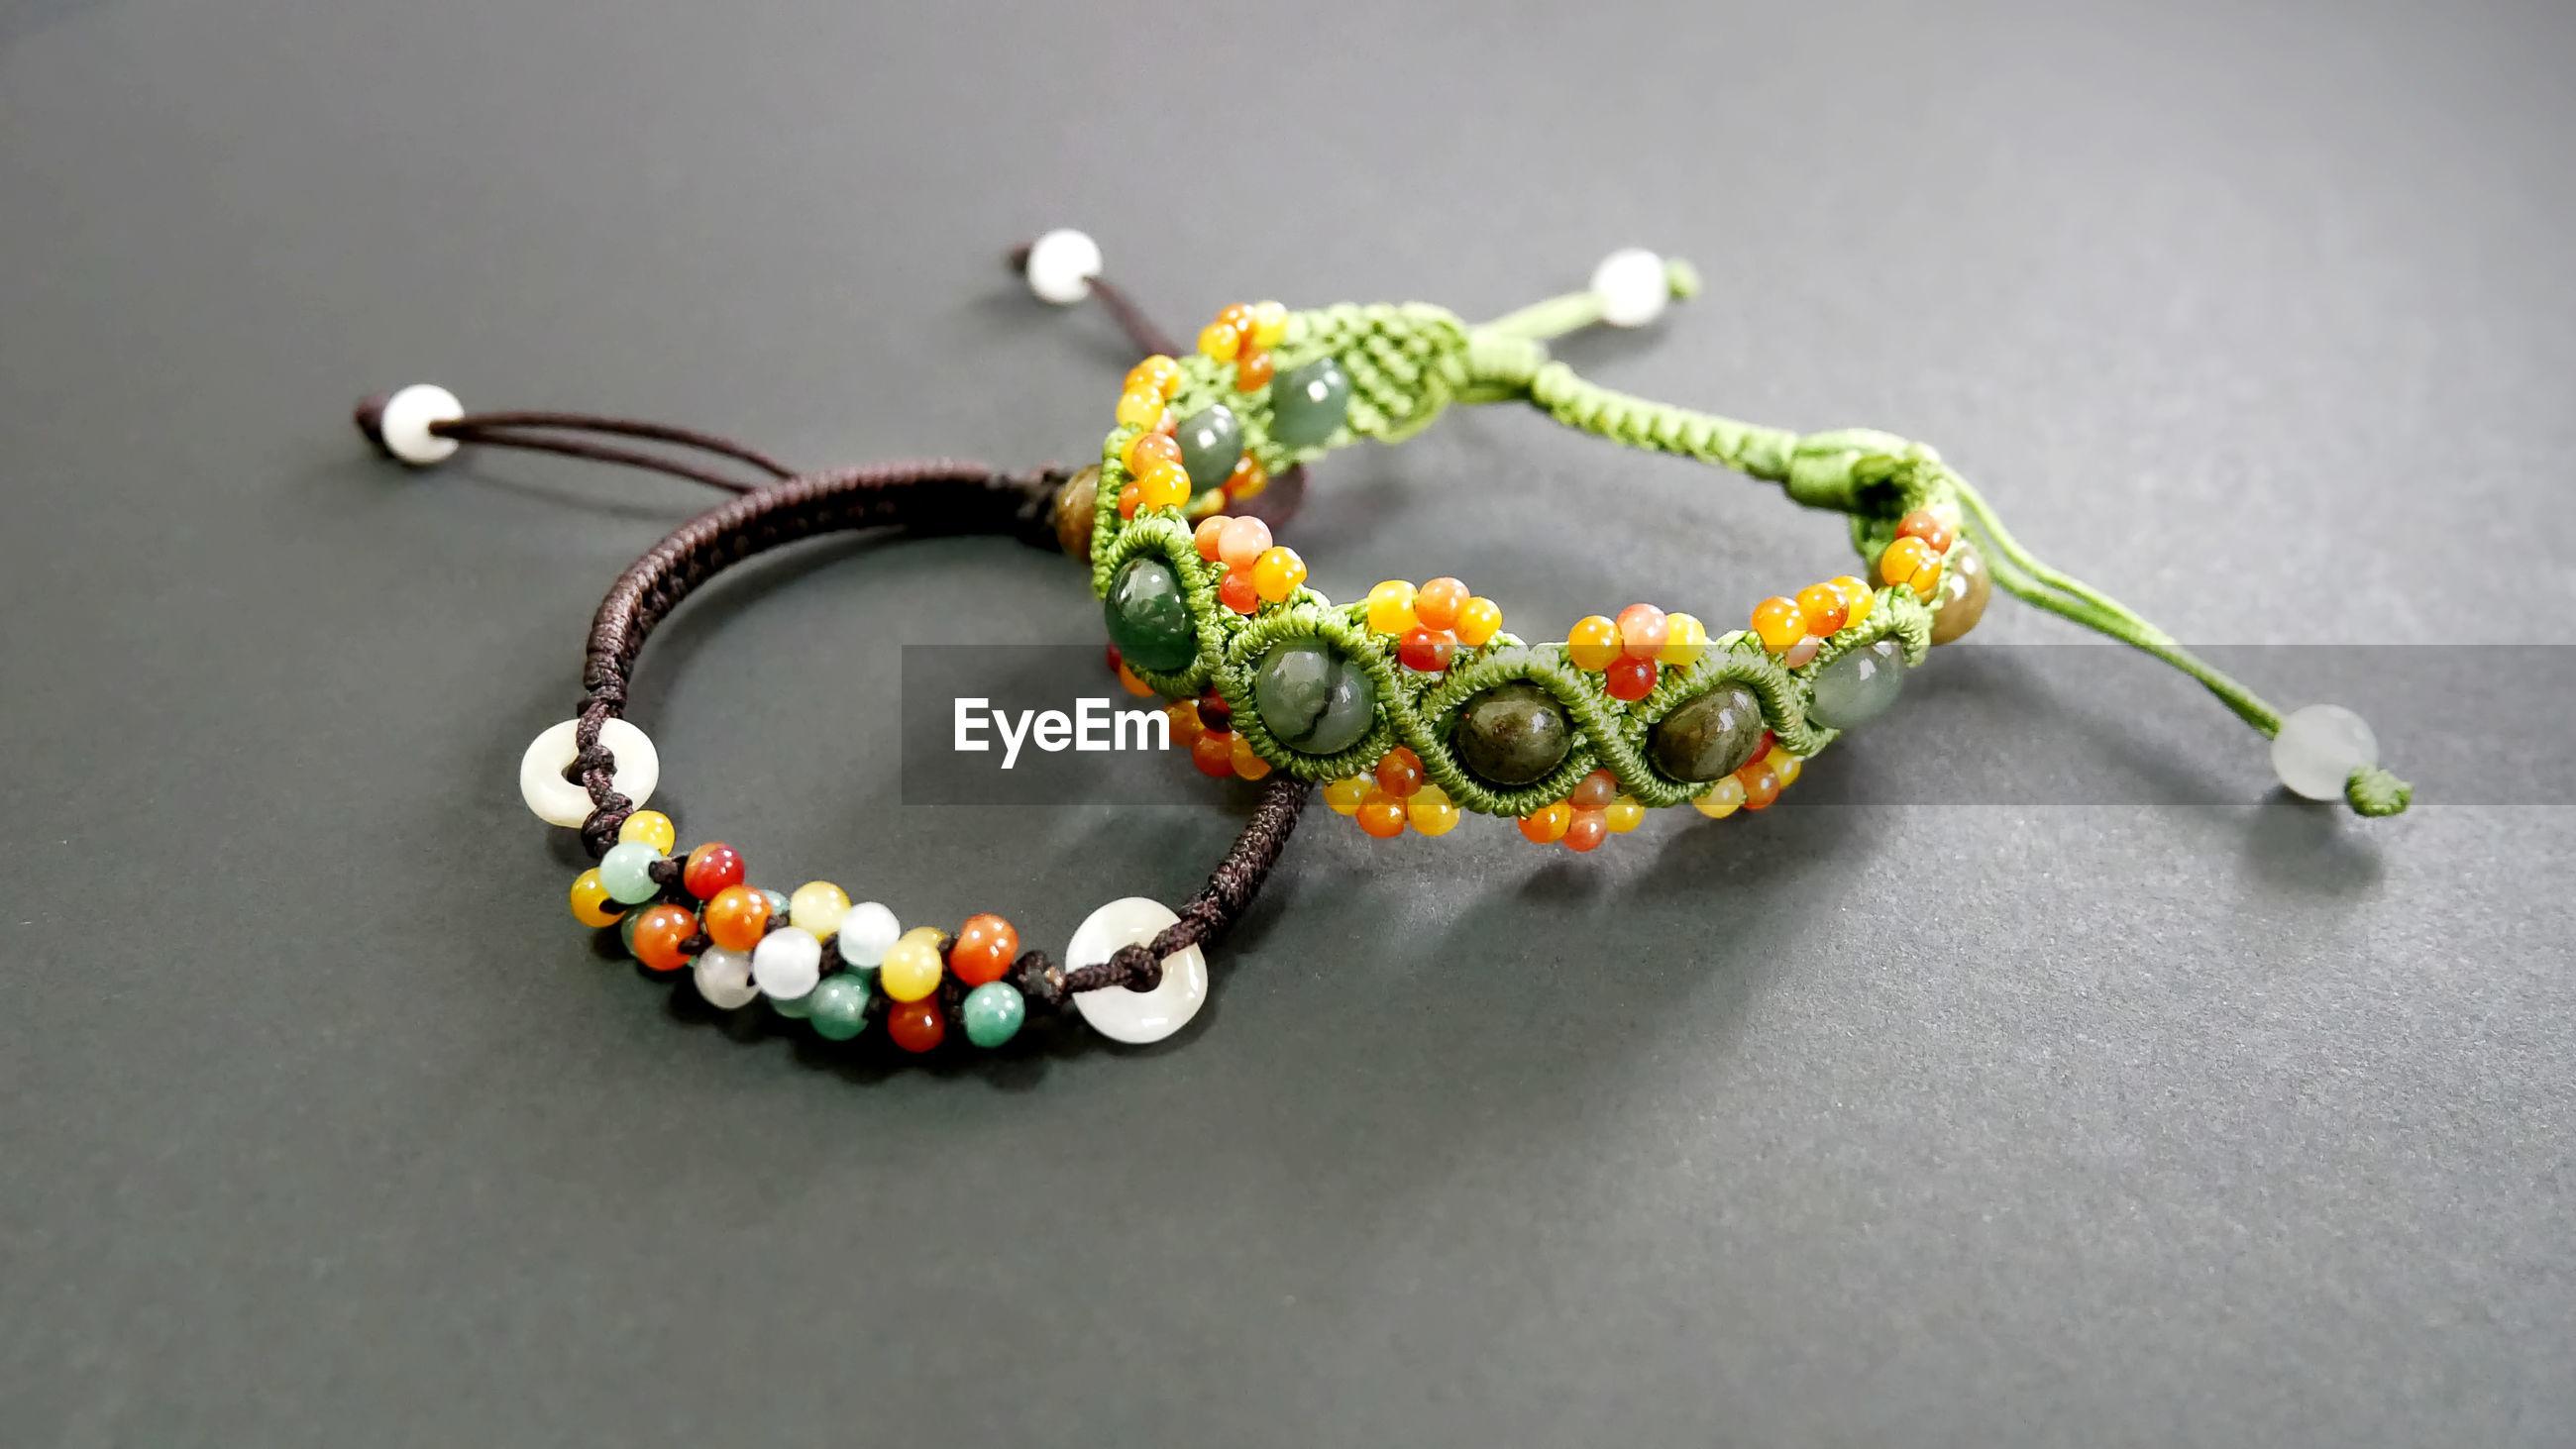 Close-up of bracelets on table